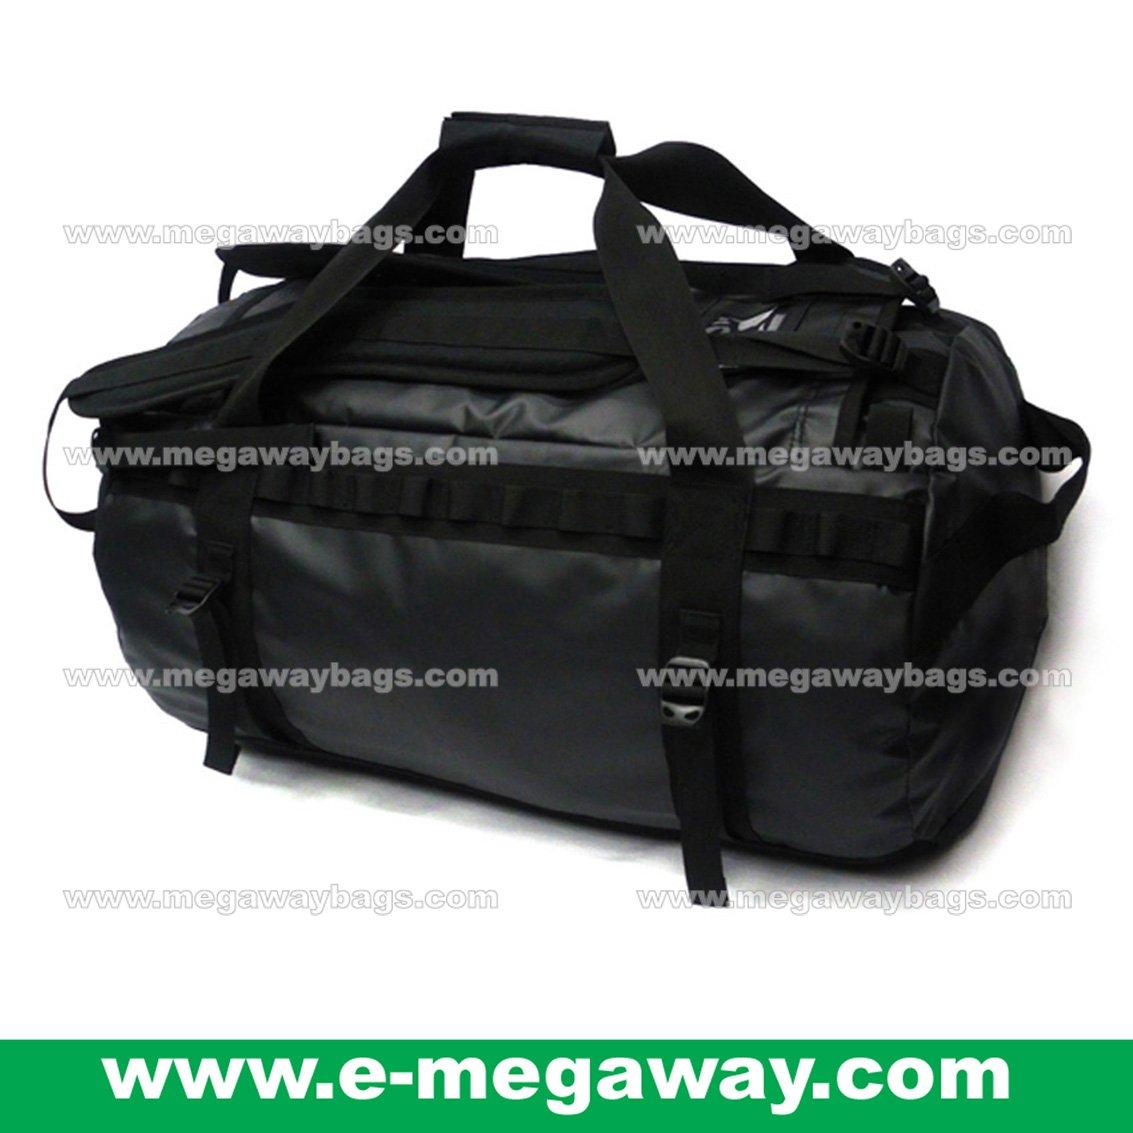 Tarpaulin Outdoor Pack Backpack Gear Duffel Kit Sport Bag Holdall Gym MegawayBags #CC-0938